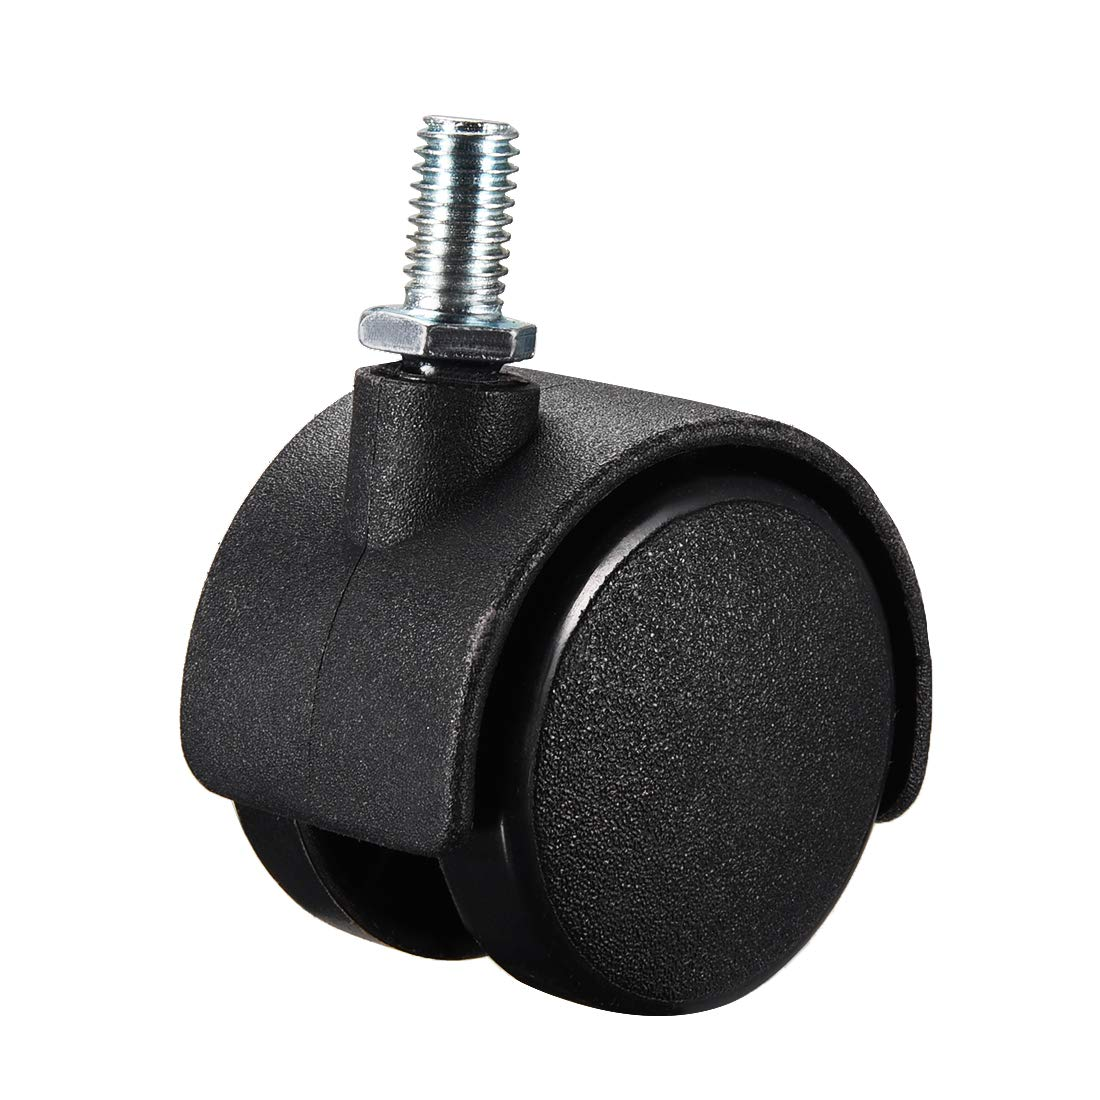 uxcell Furniture Casters 1.5 Inch Nylon M8 x 15mm Threaded Stem Swivel Caster Wheels 33lb Capacity Each Wheel 5 Pcs